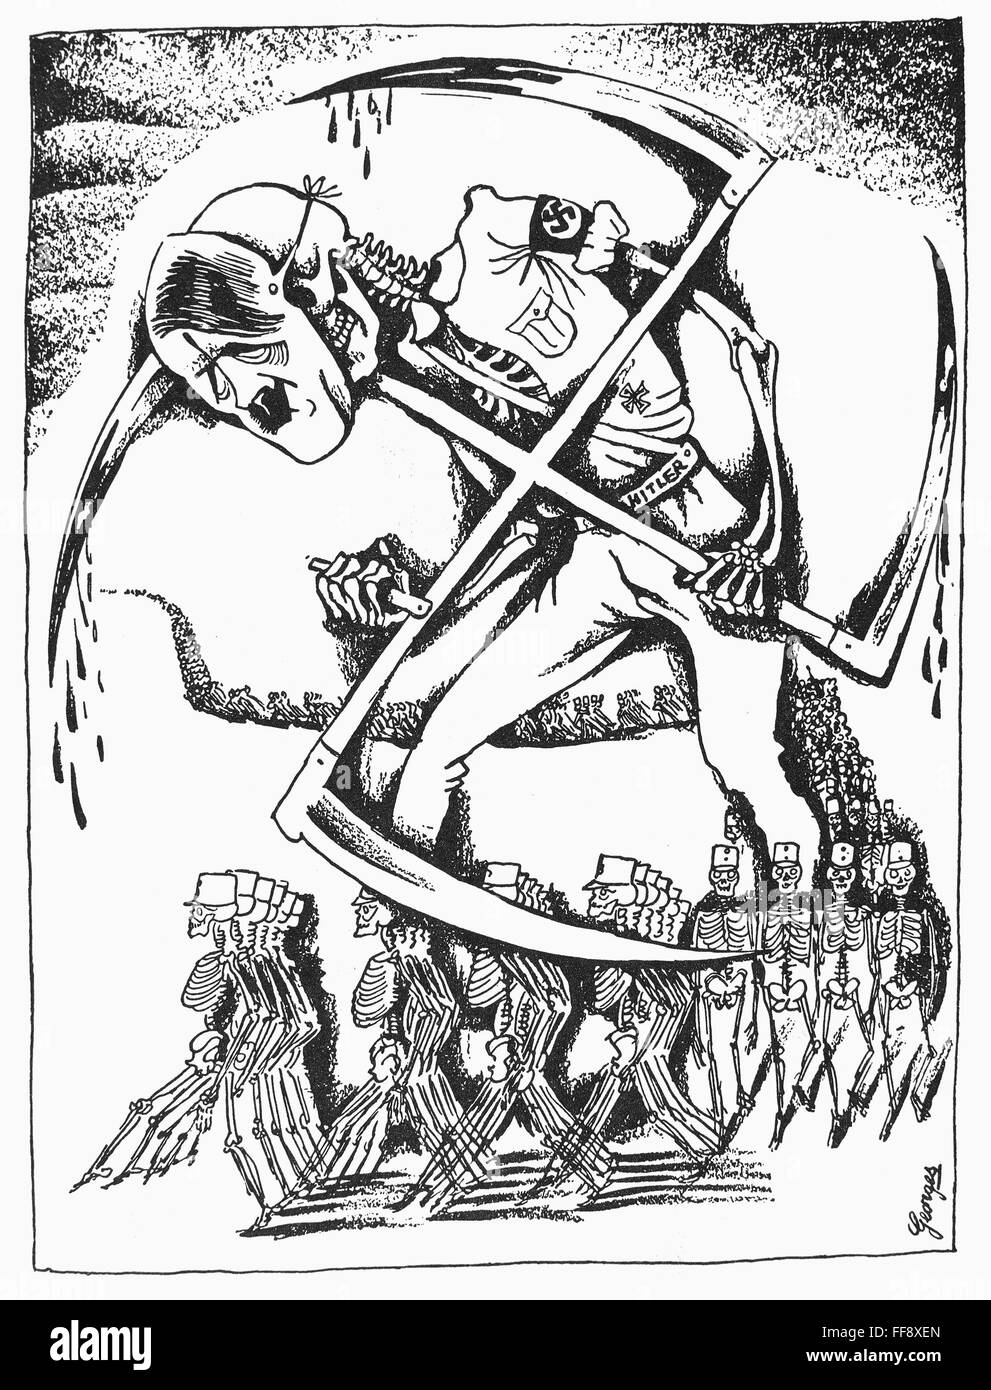 HITLER-Karikatur, c1940. /nFrench Cartoon, c1940